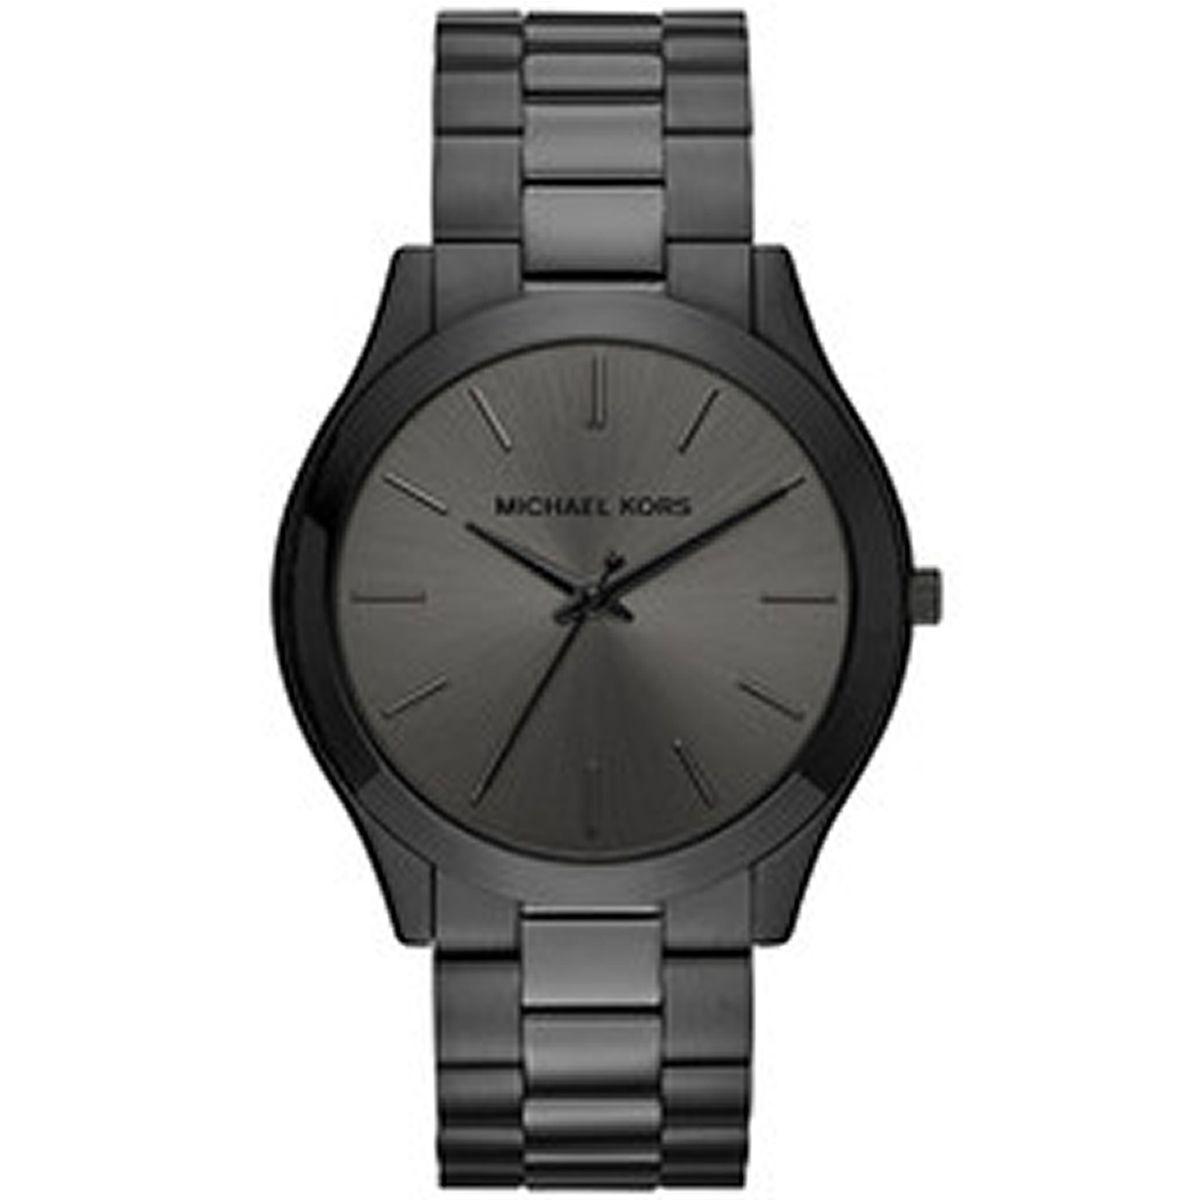 6d9a8cc8f2b1 Michael Kors Watches - Macy s